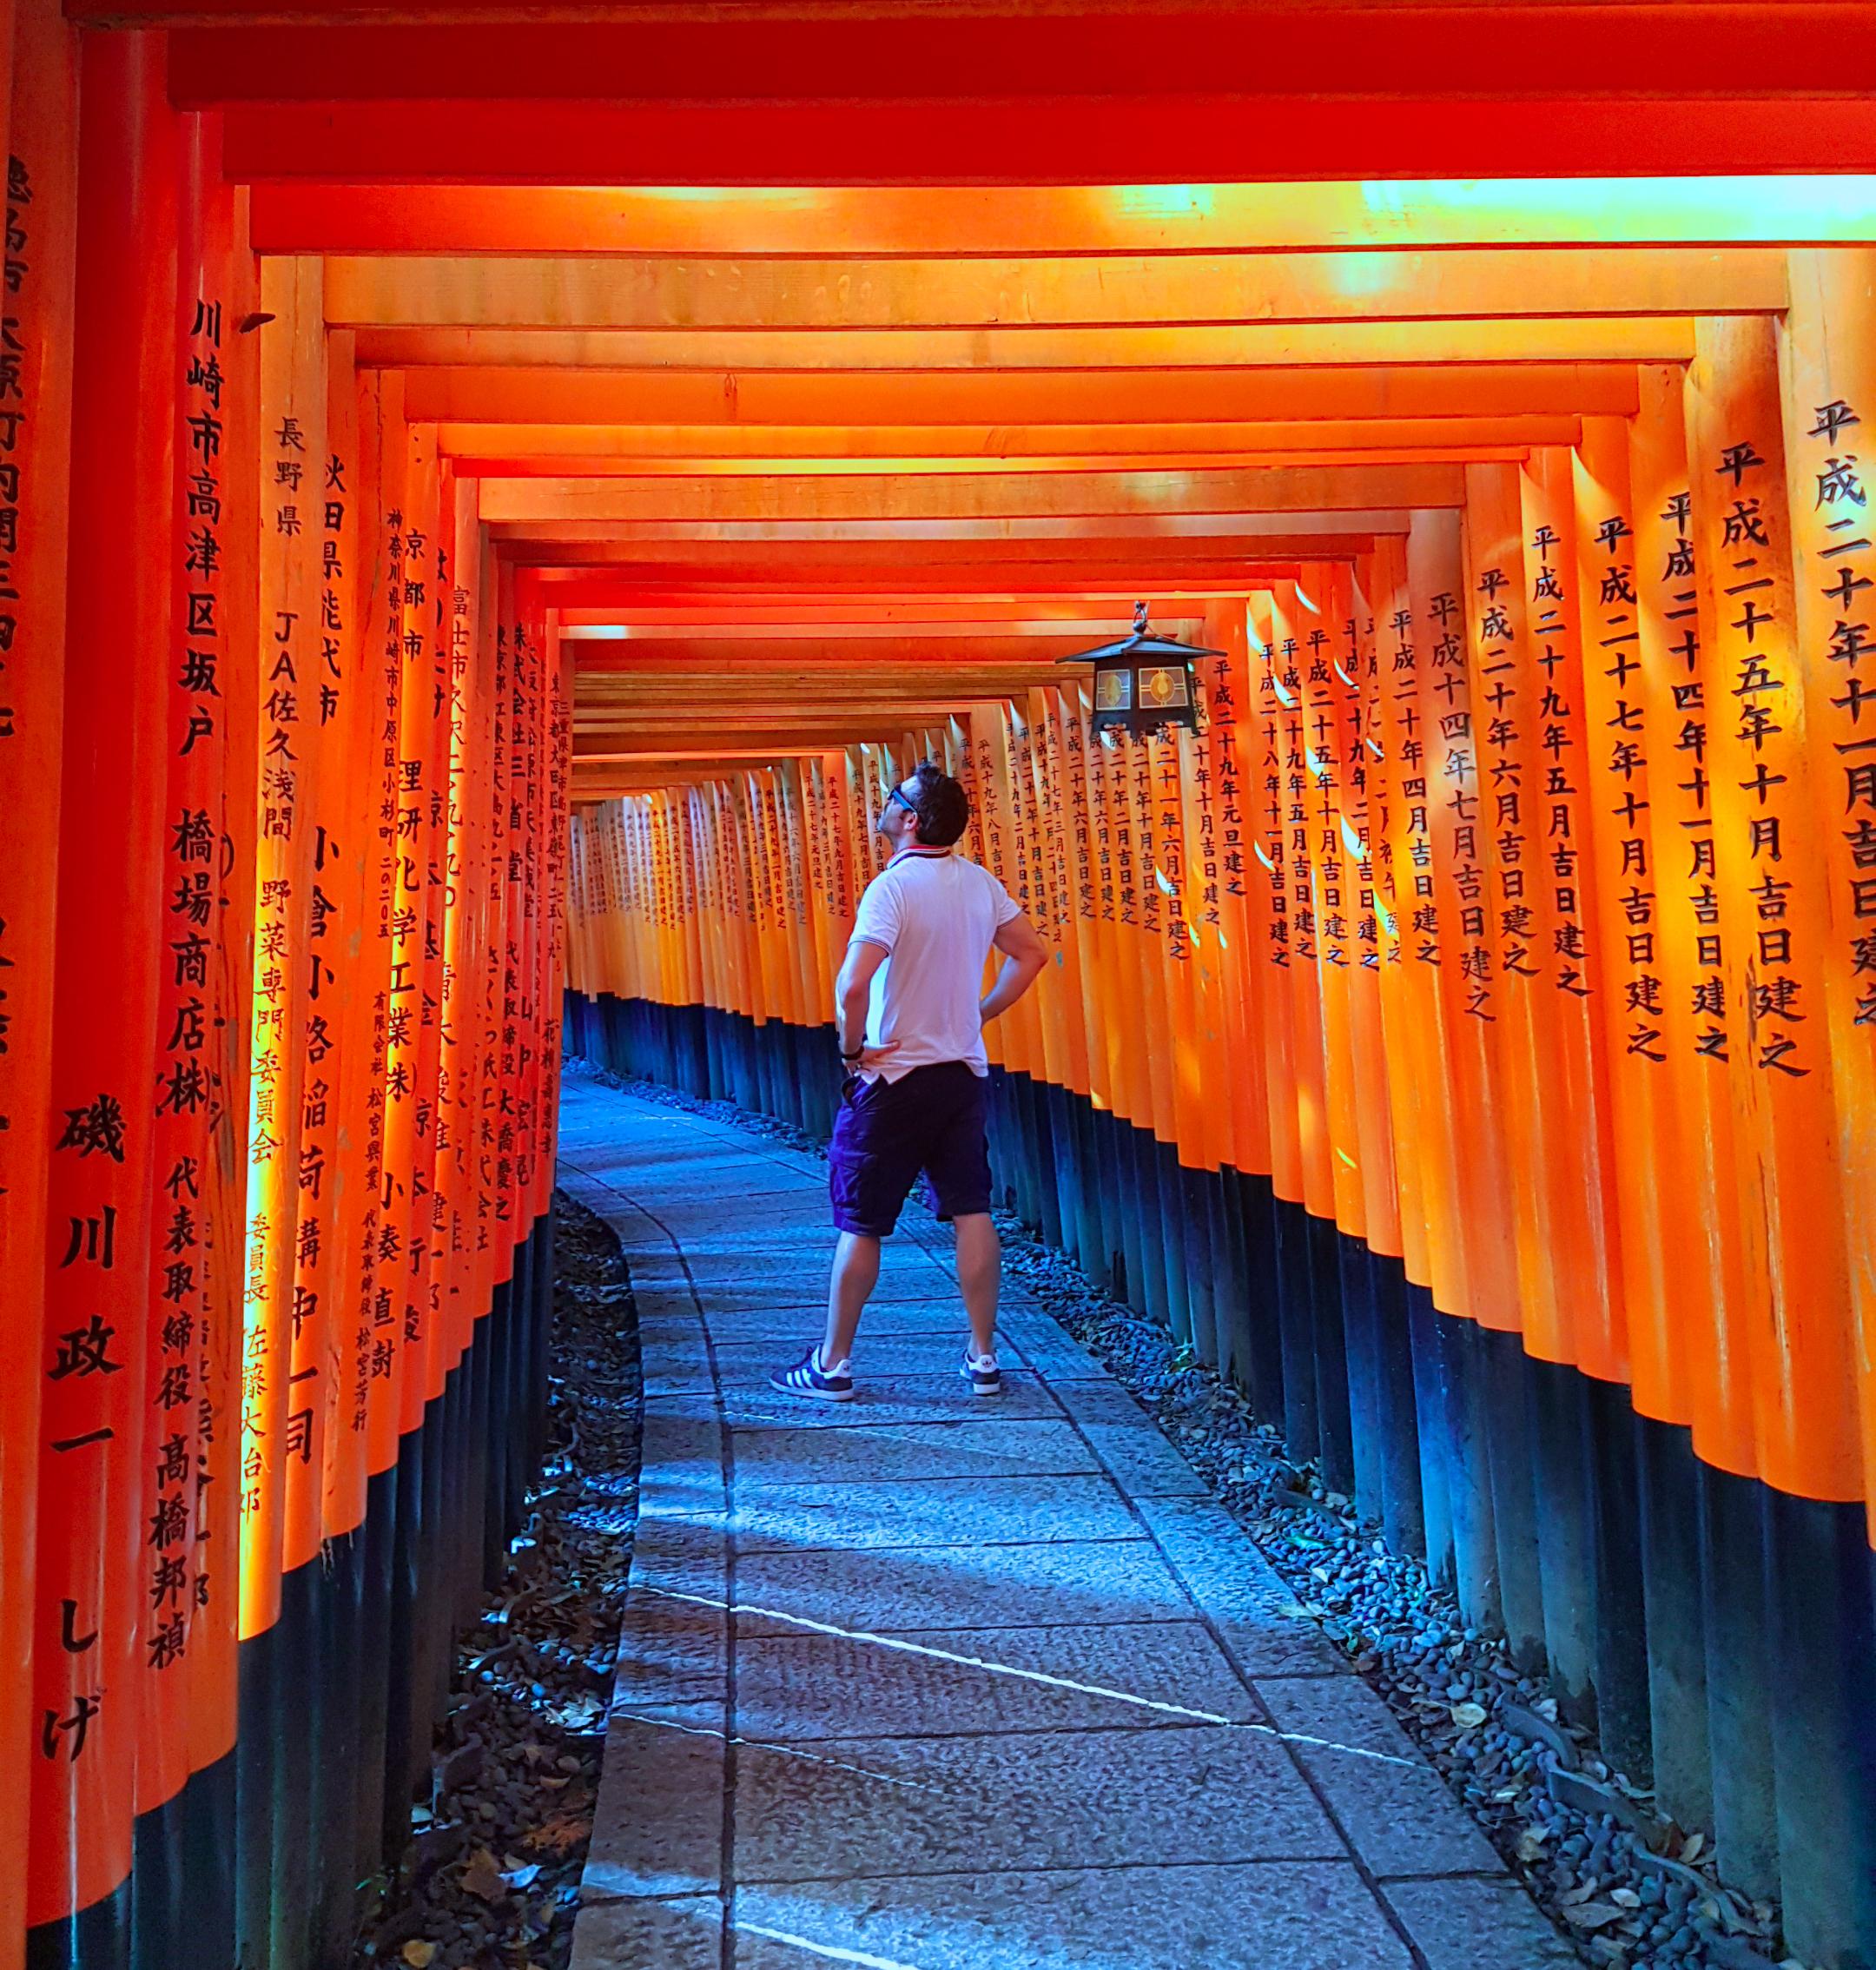 Inari Shrine Torii - Kyoto / Kioto - Viajar a Japón - ruta por Japón en dos semanas ruta por japón en dos semanas - 36904412365 ae61240b2c o - Nuestra Ruta por Japón en dos semanas (Diario de Viaje a Japón)